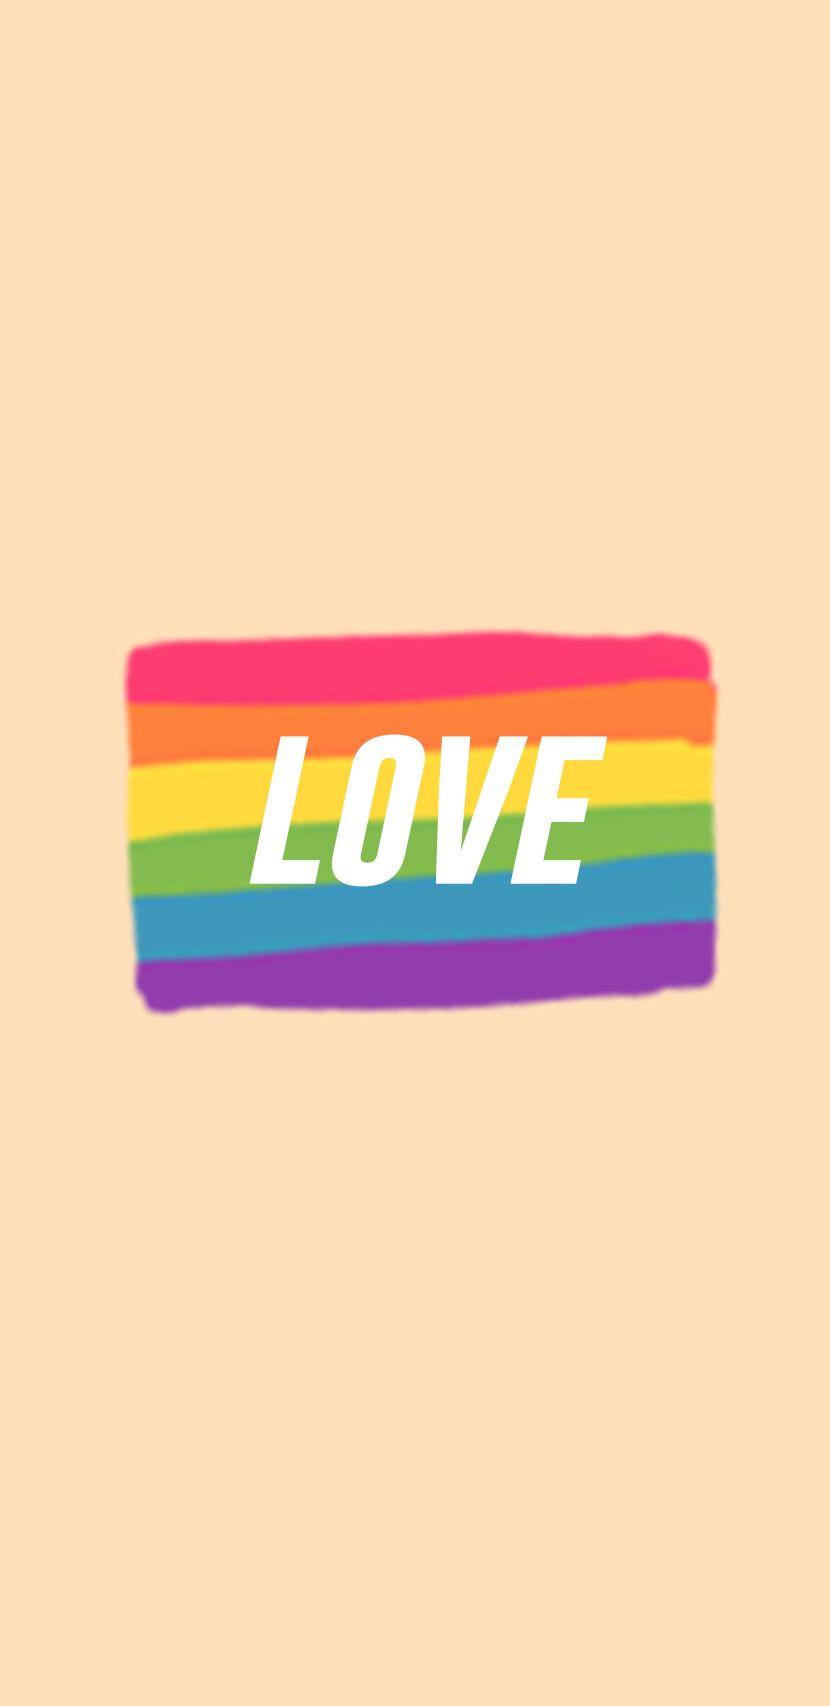 Happy Pride Month Pride Flag Aesthetic Wallpaper Pride Aesthetic Wallpaper Rainbow Wallpaper Aesthetic pride month rainbow wallpaper